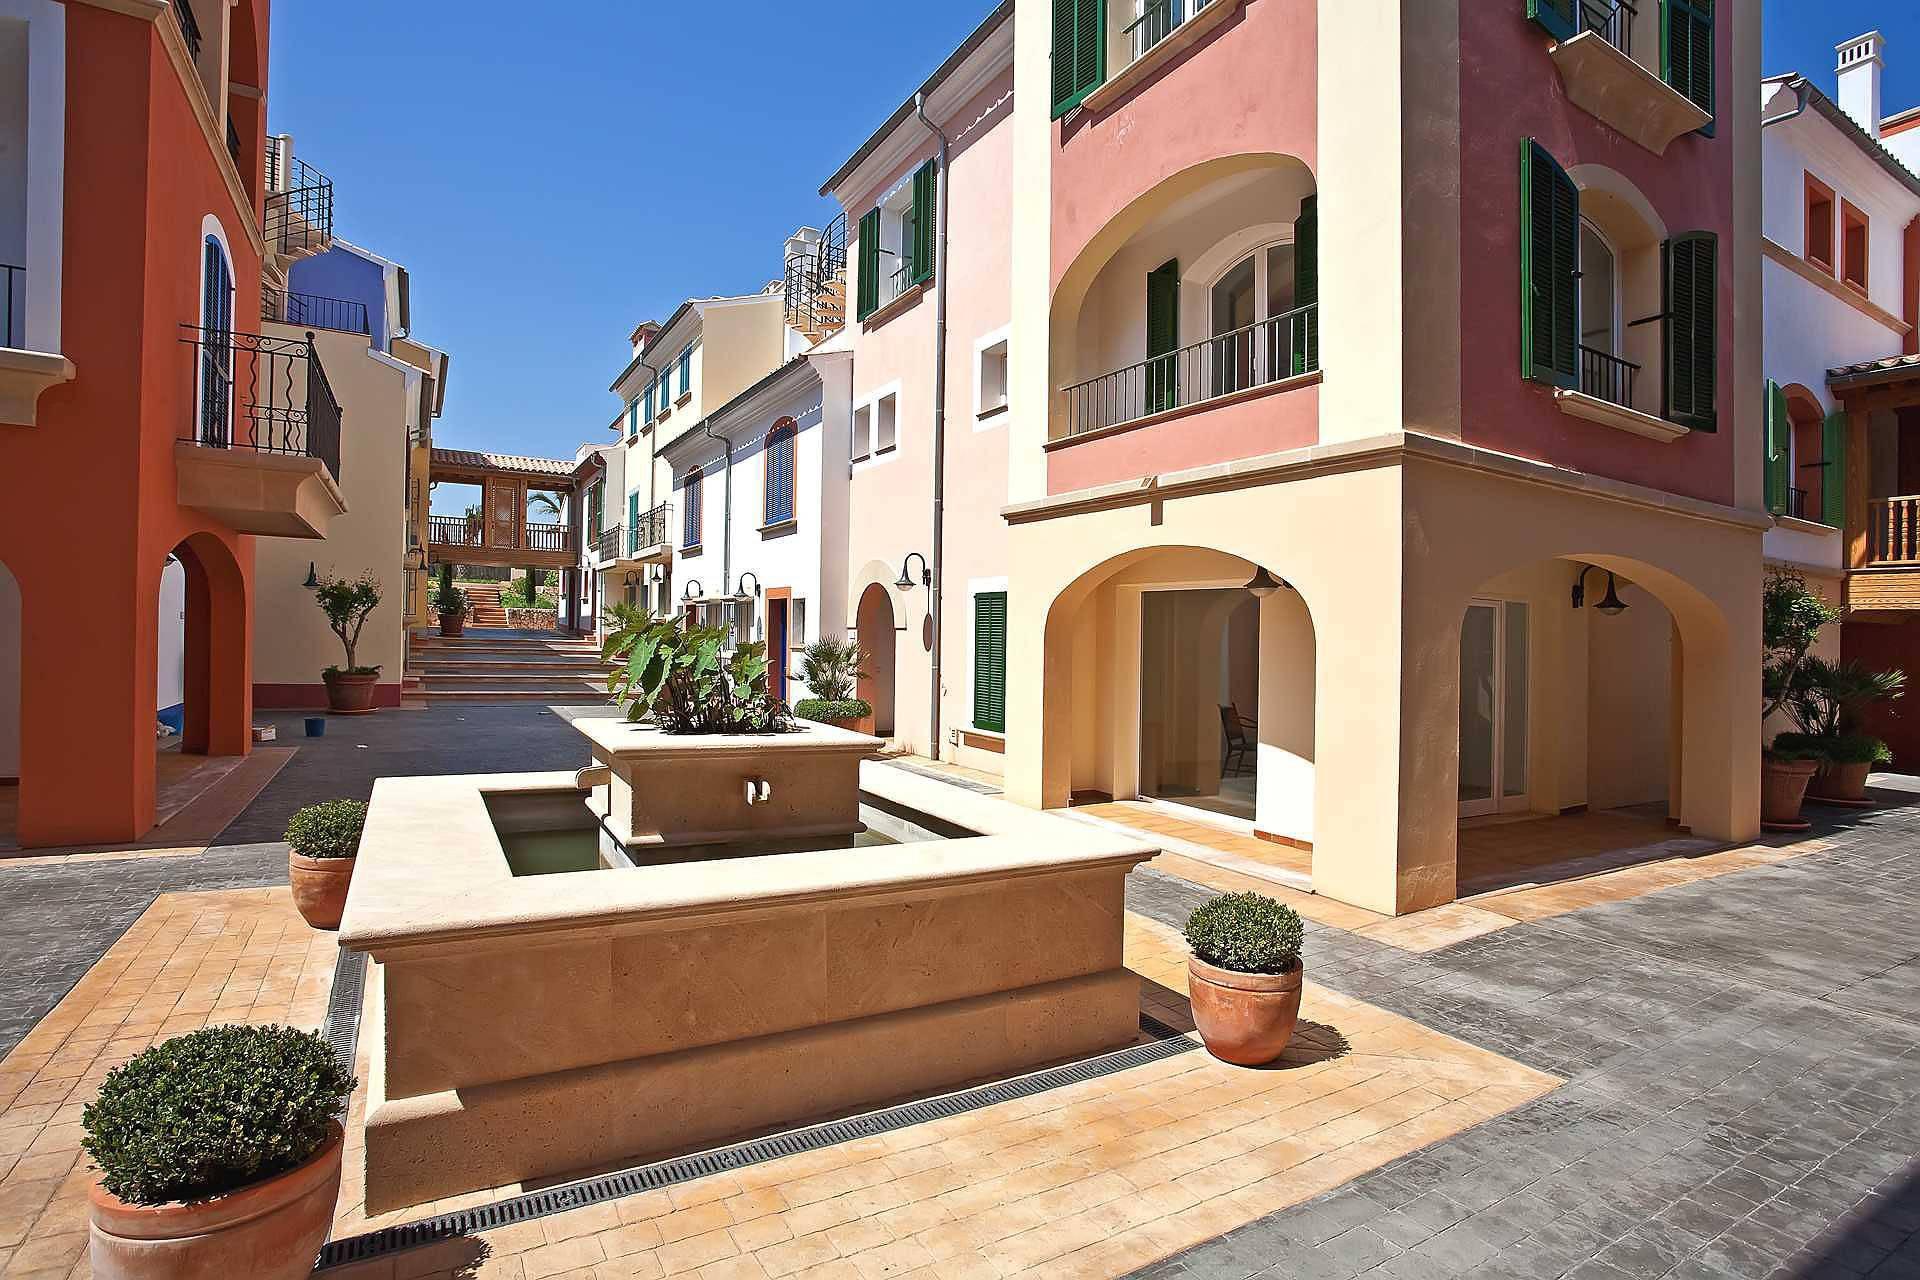 01-62 Modernes Ferienhaus Mallorca Osten Bild 7